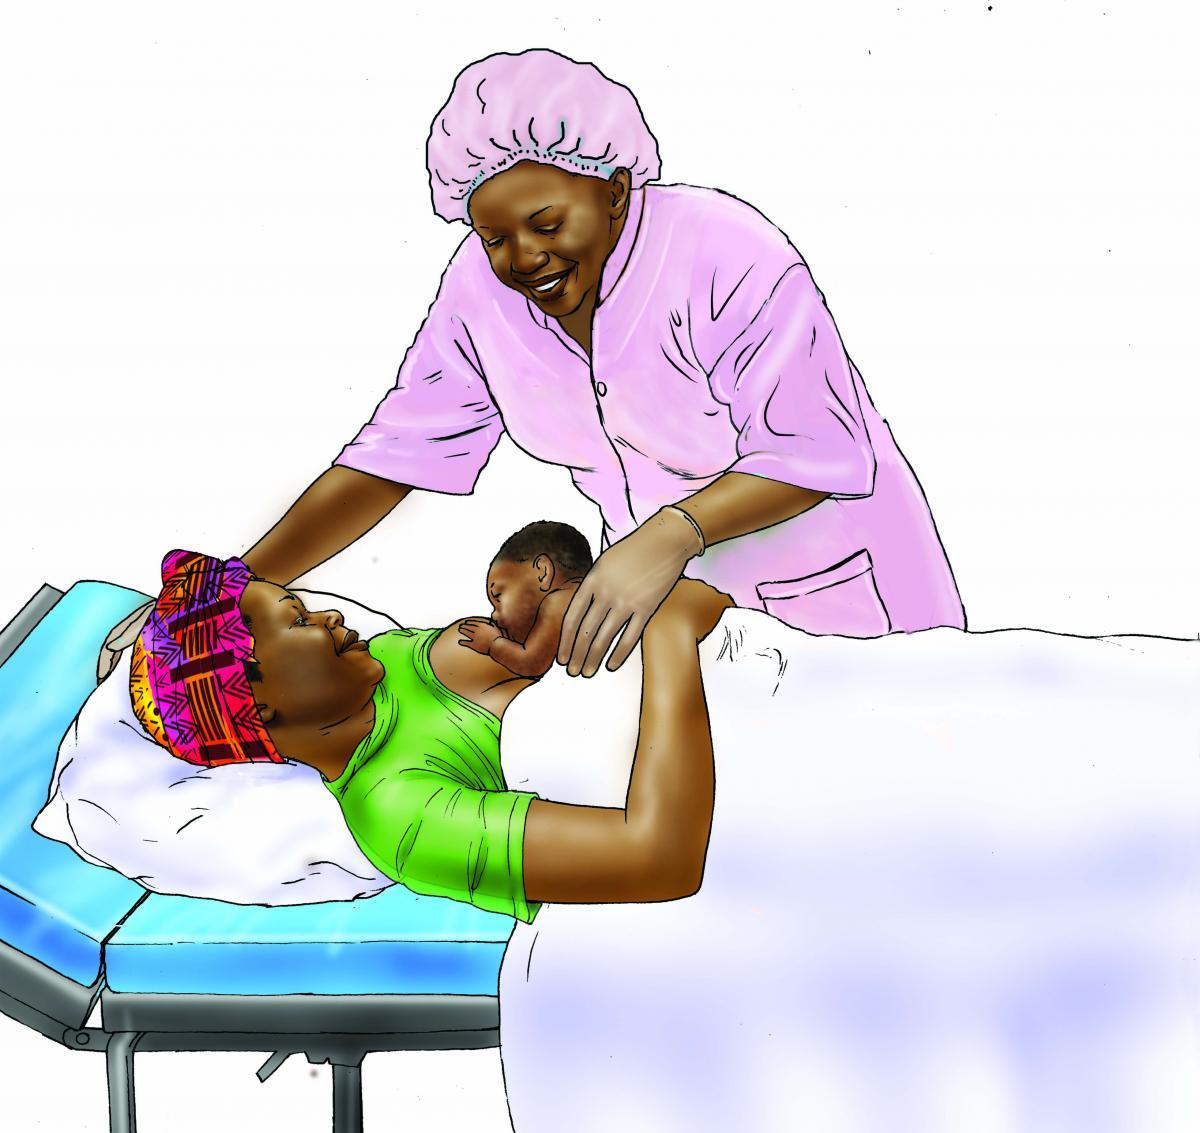 Breastfeeding - Early initiation of breastfeeding 0-6 mo - 01H - Senegal